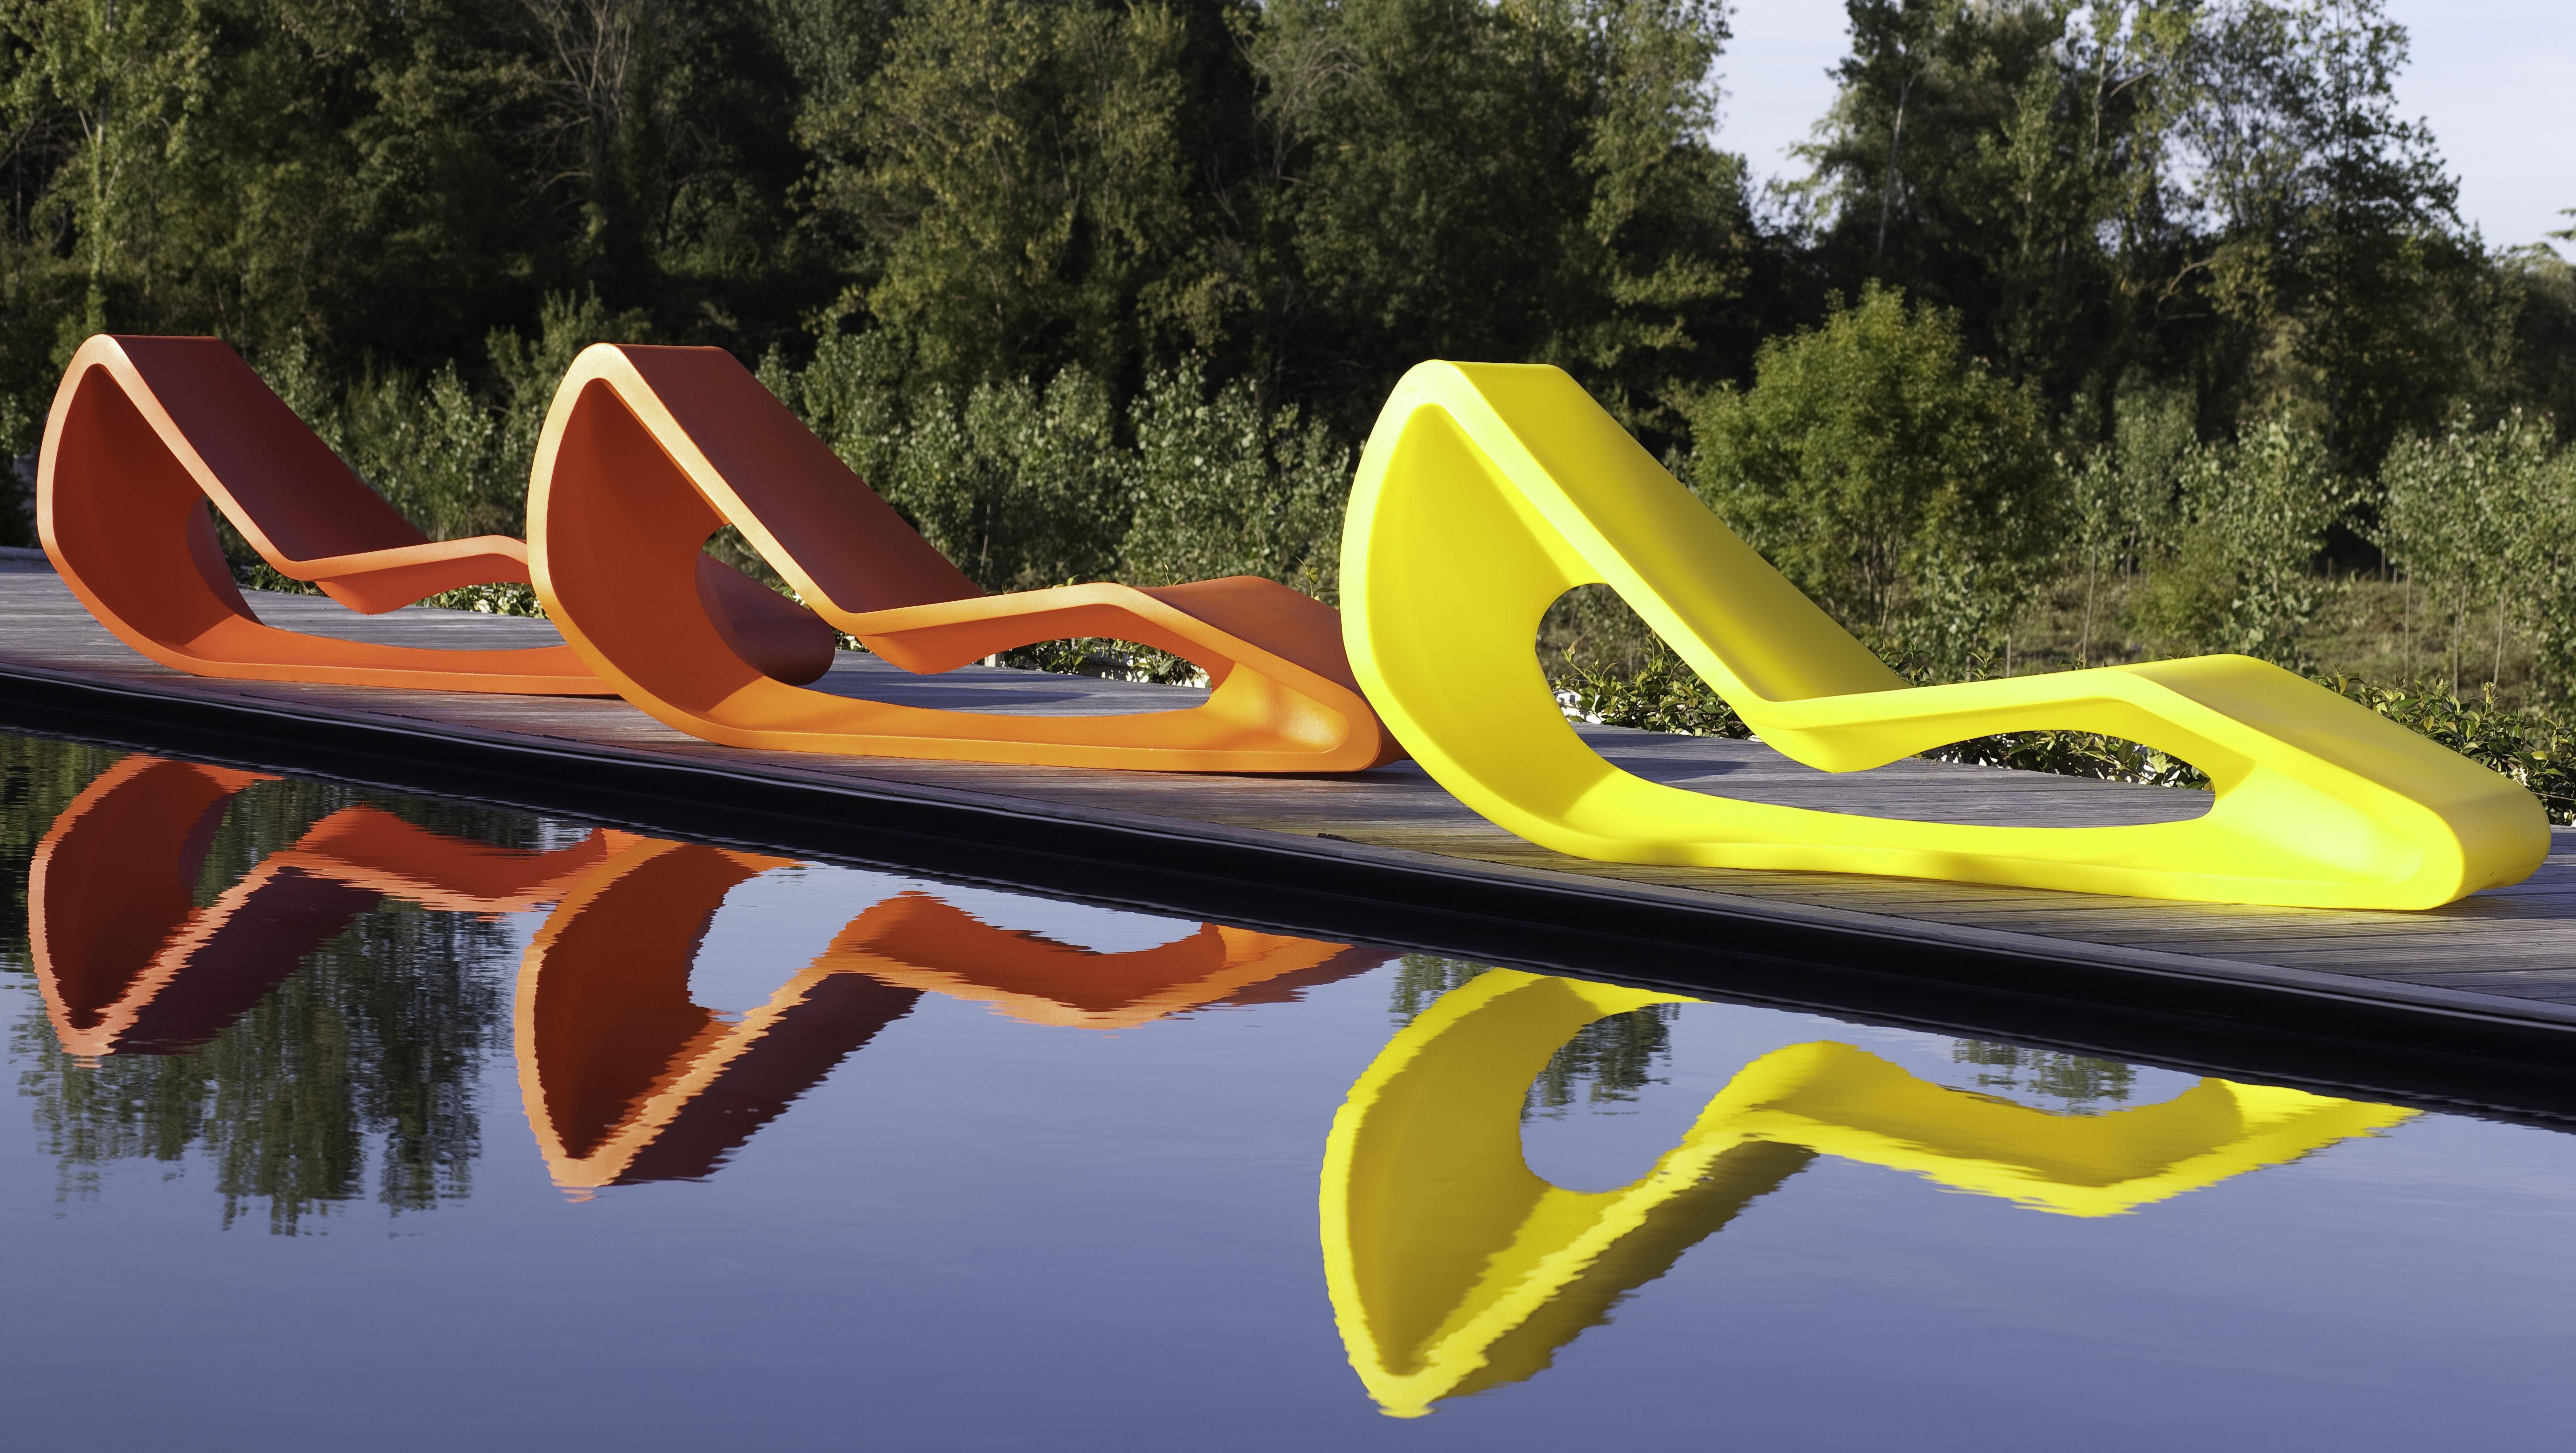 chaise longue organic orange qui est paul. Black Bedroom Furniture Sets. Home Design Ideas